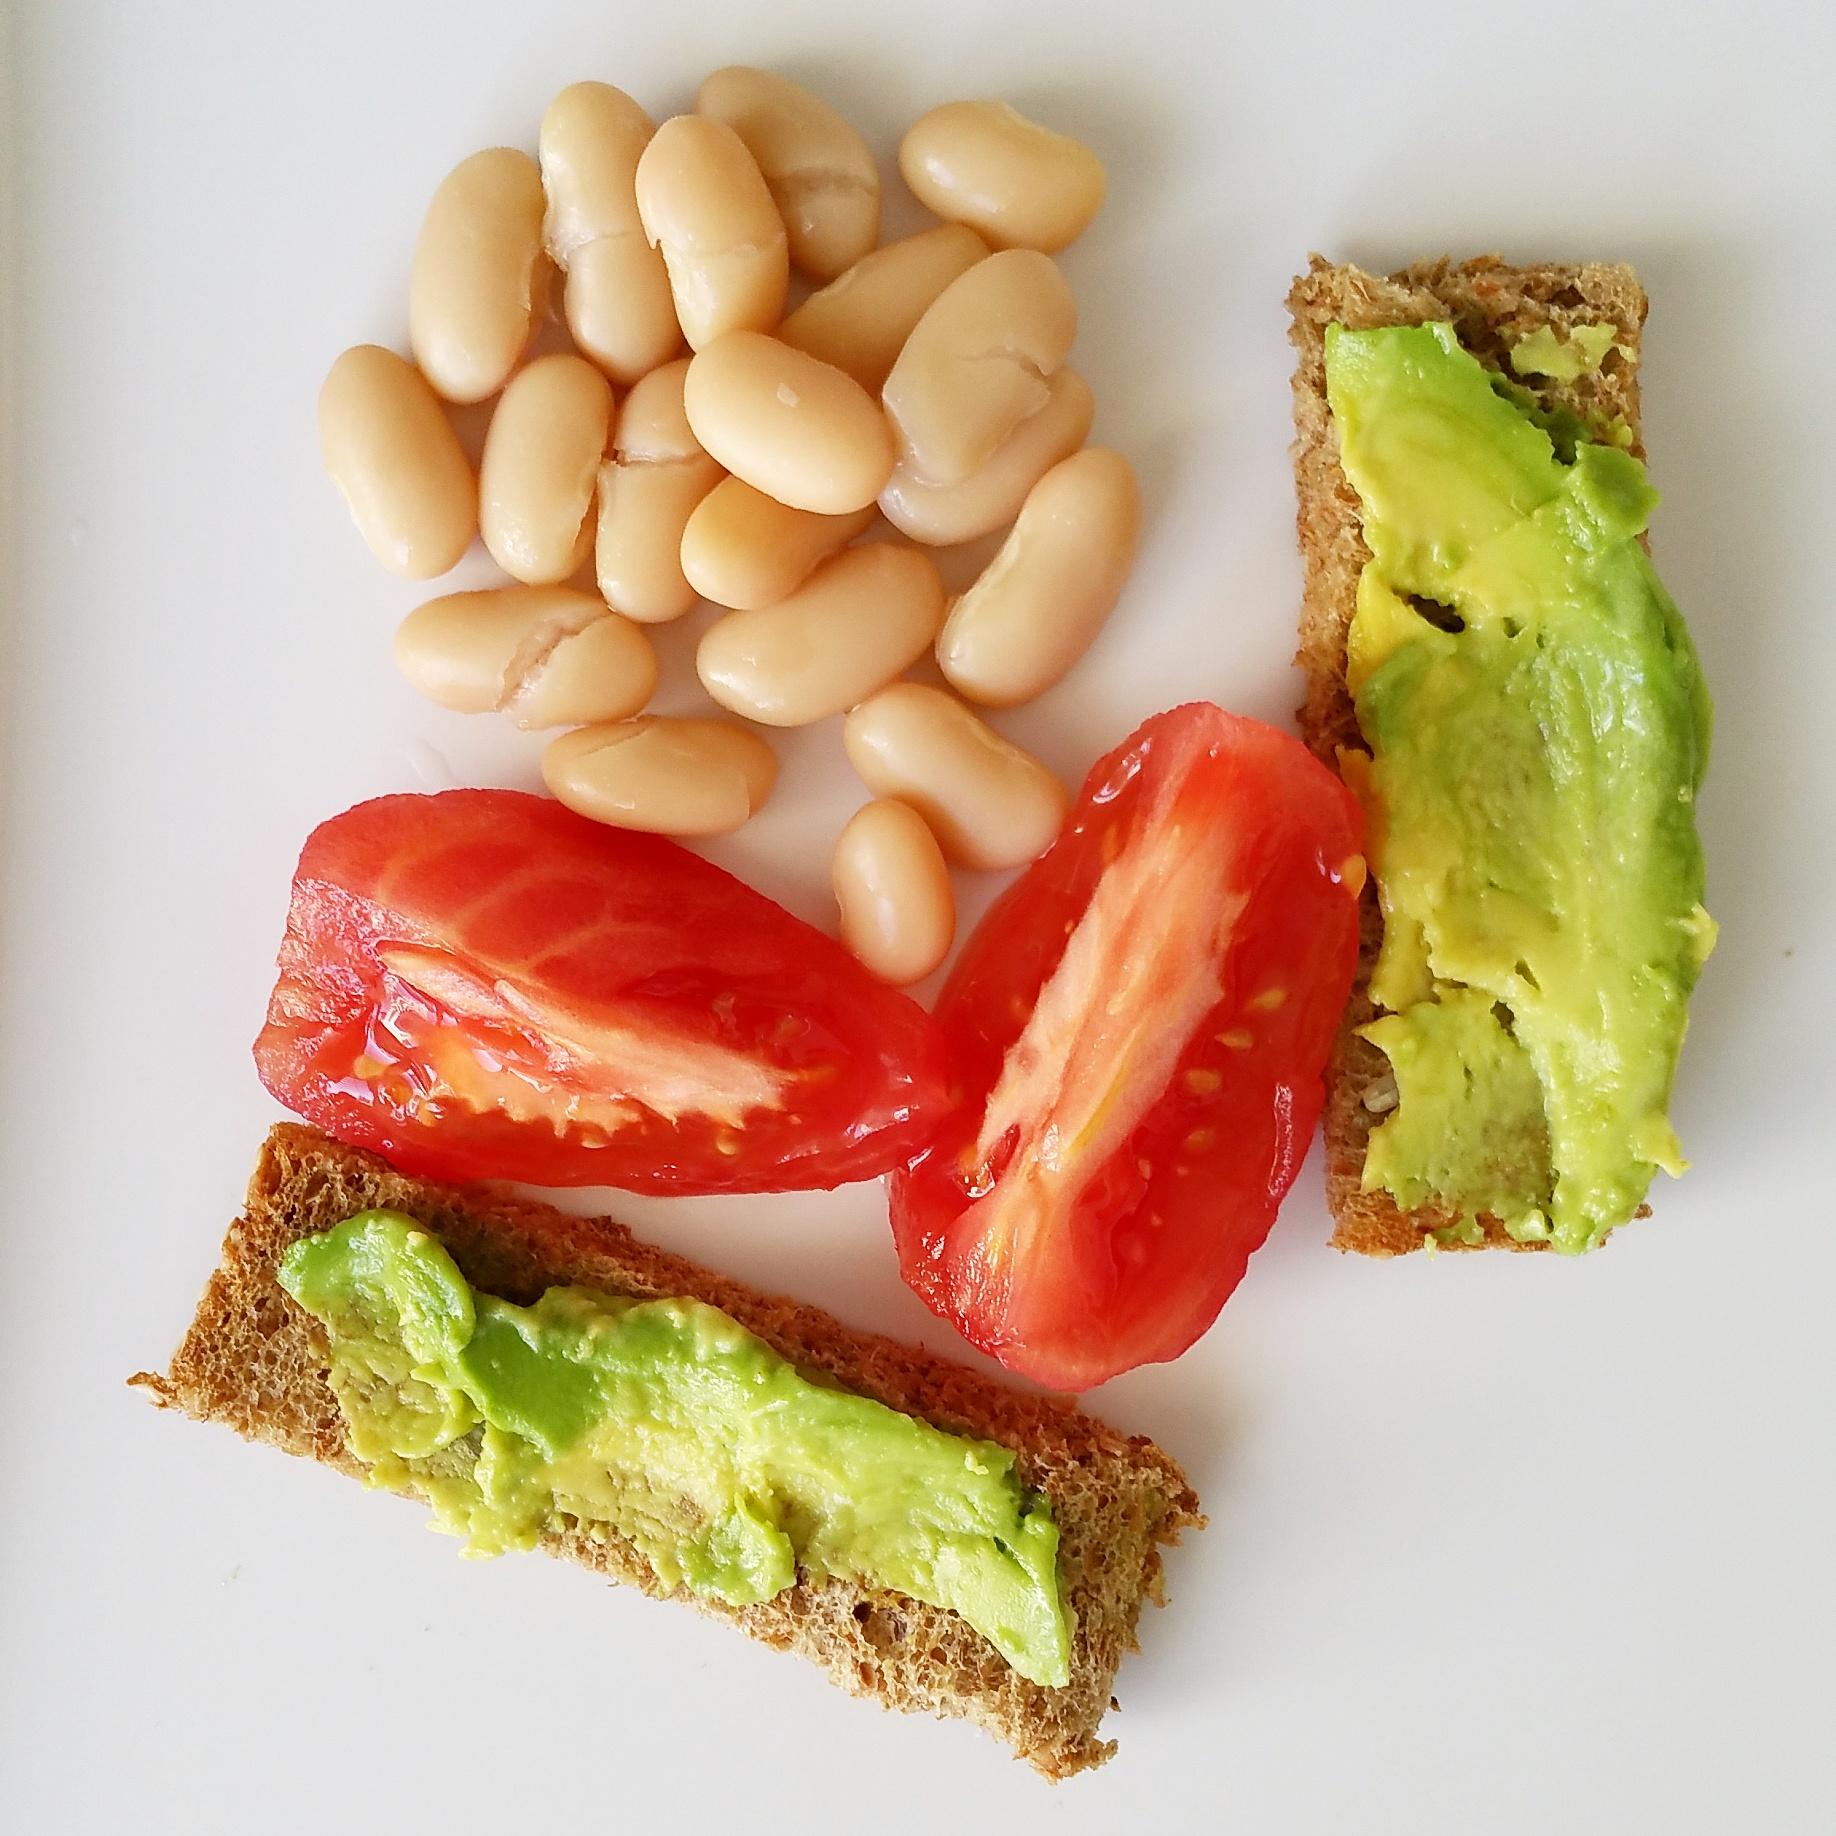 sprouted grain toast with avocado, tomato, white beans